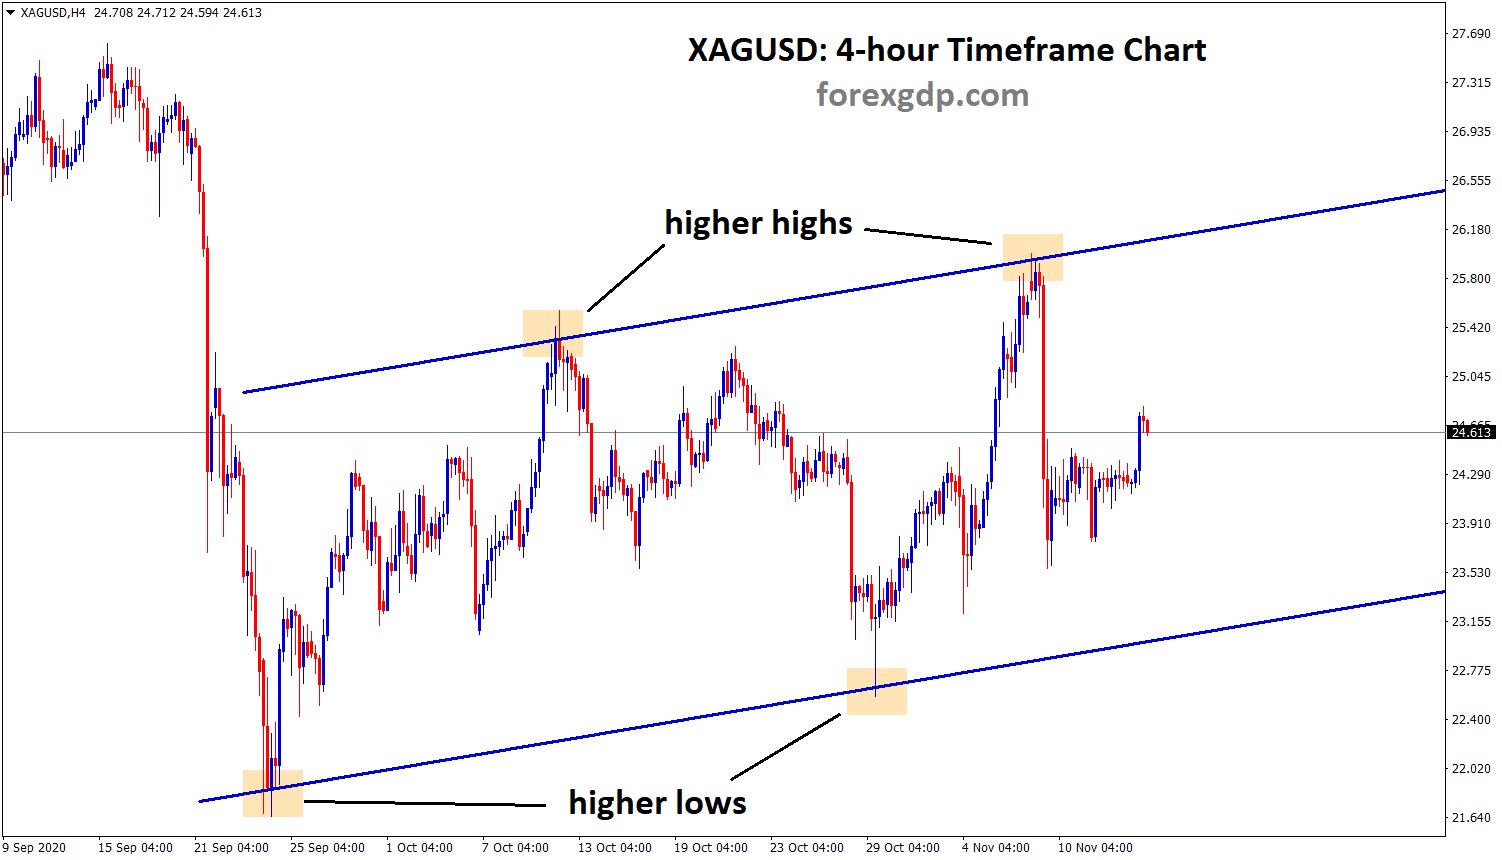 XAGUSDH4 silver ascending channel pattern